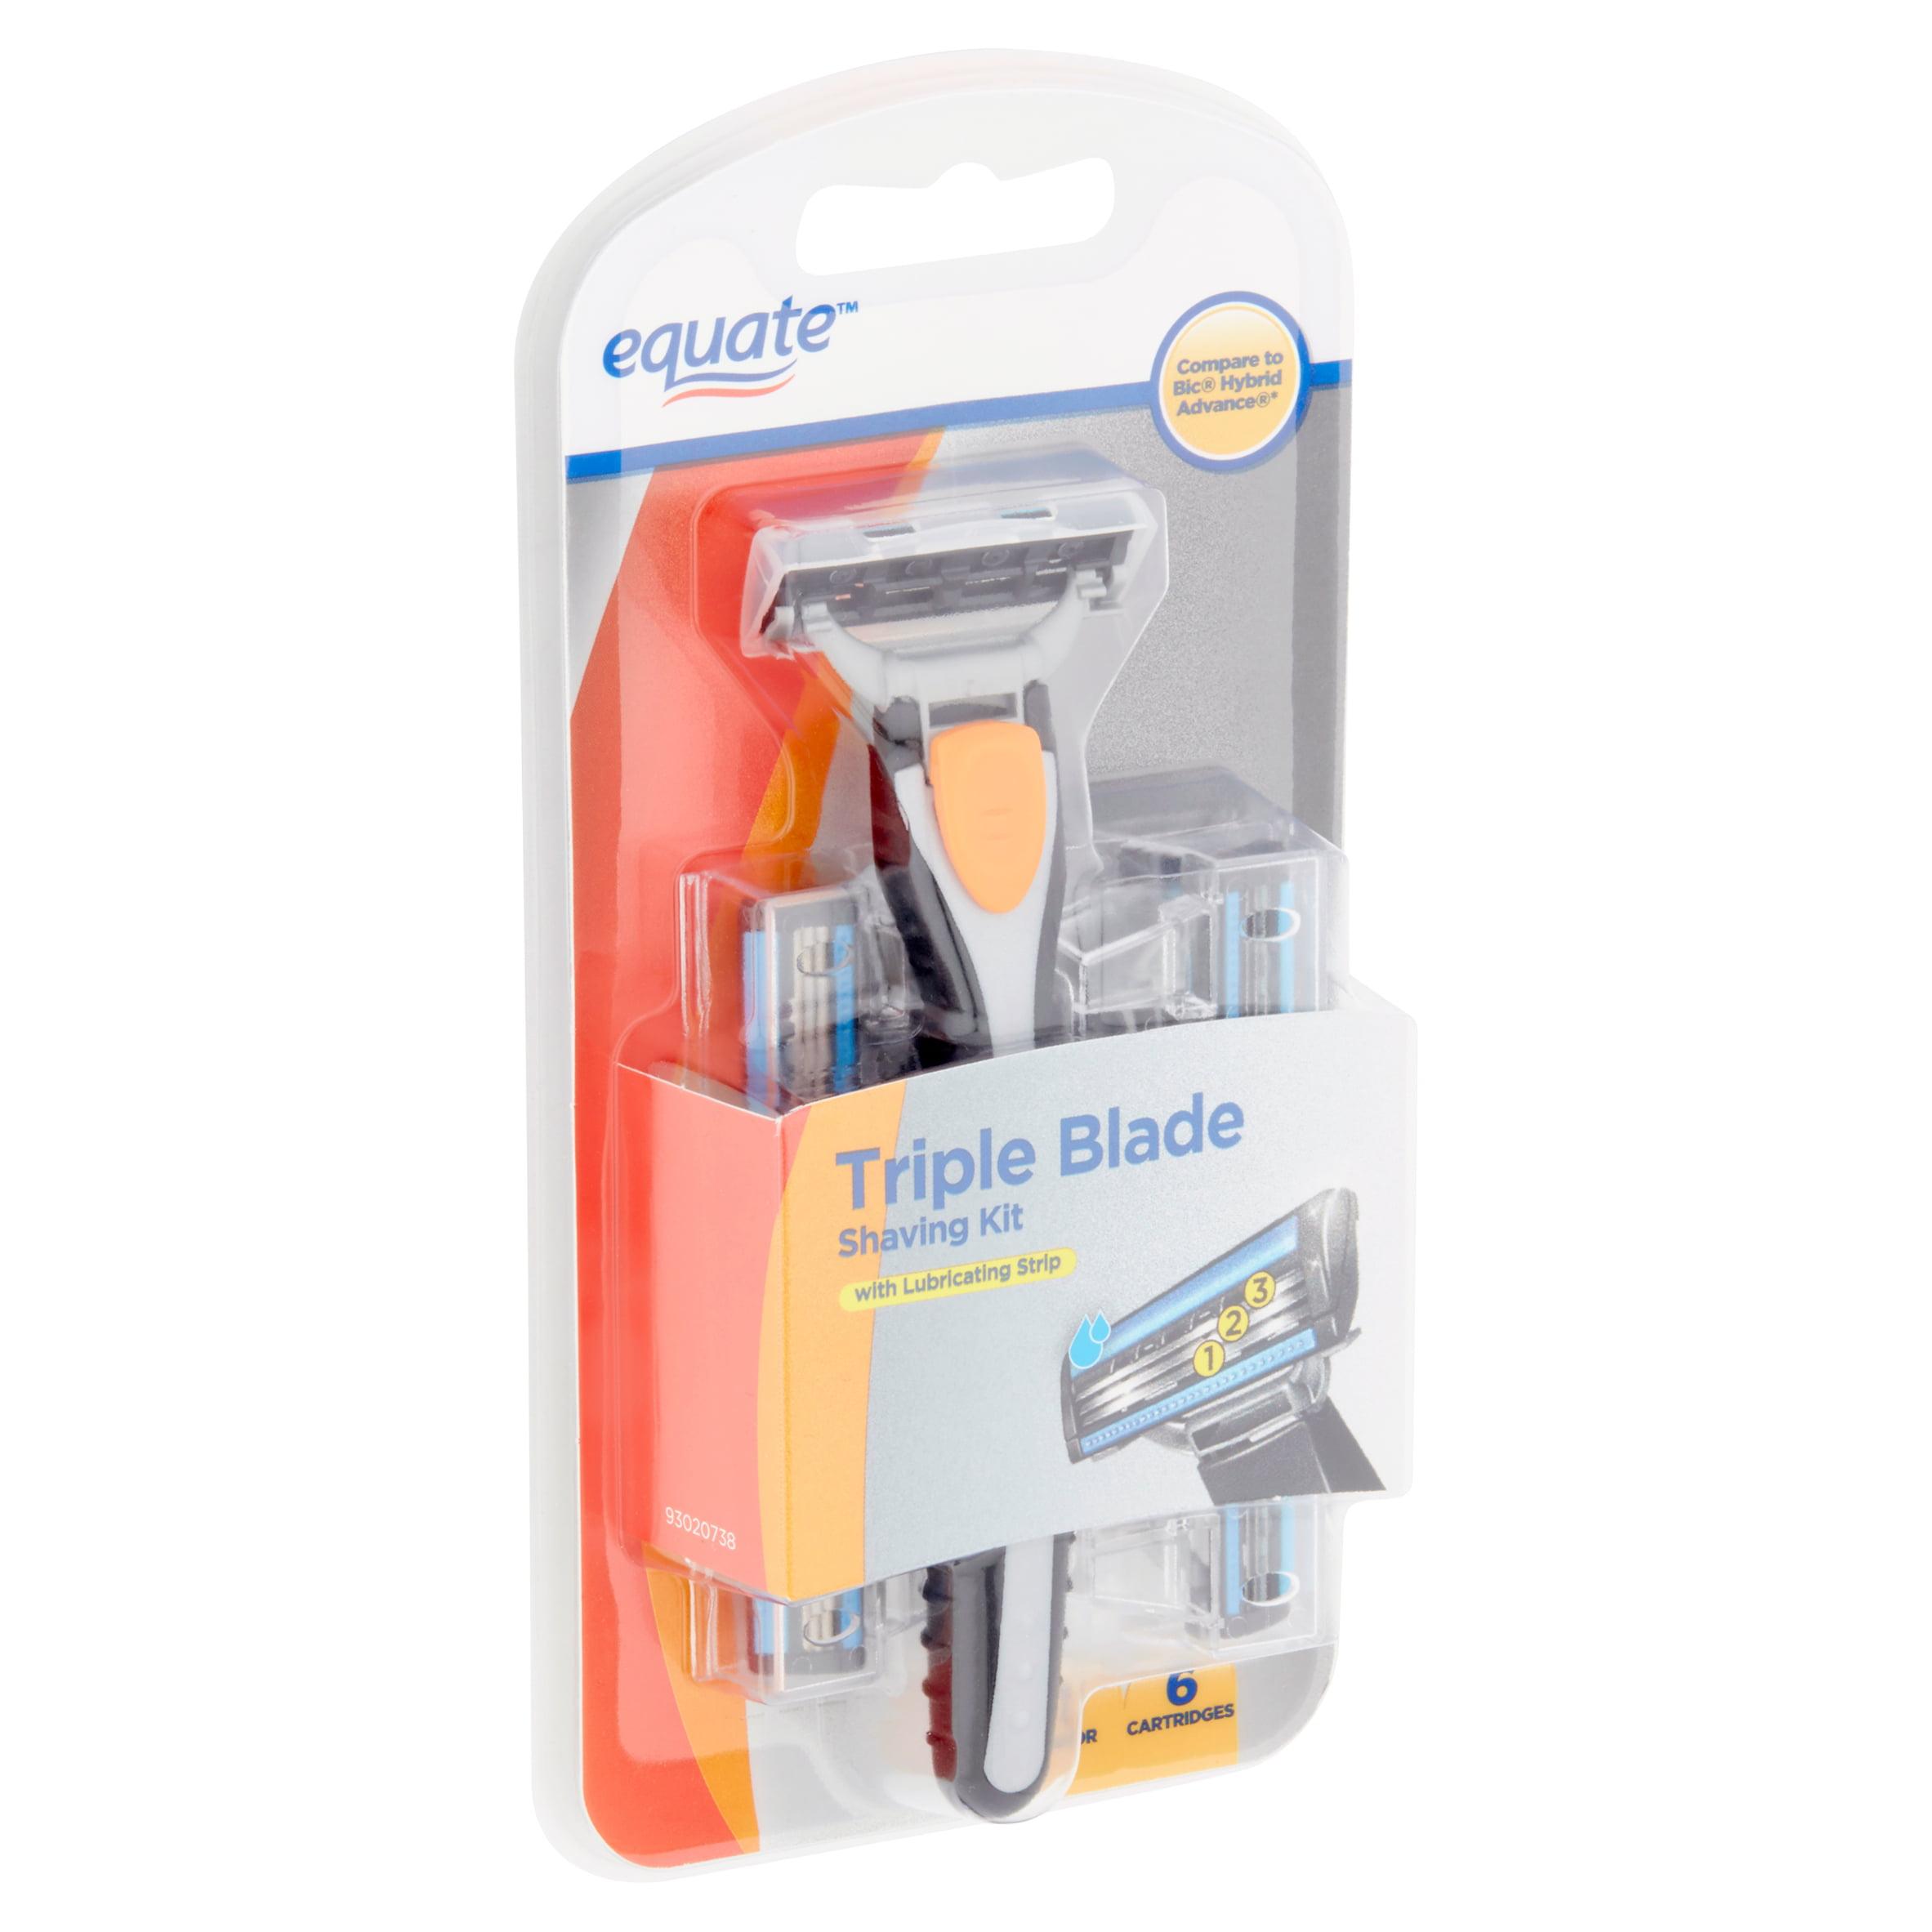 Equate Triple Blade Shaving Kit